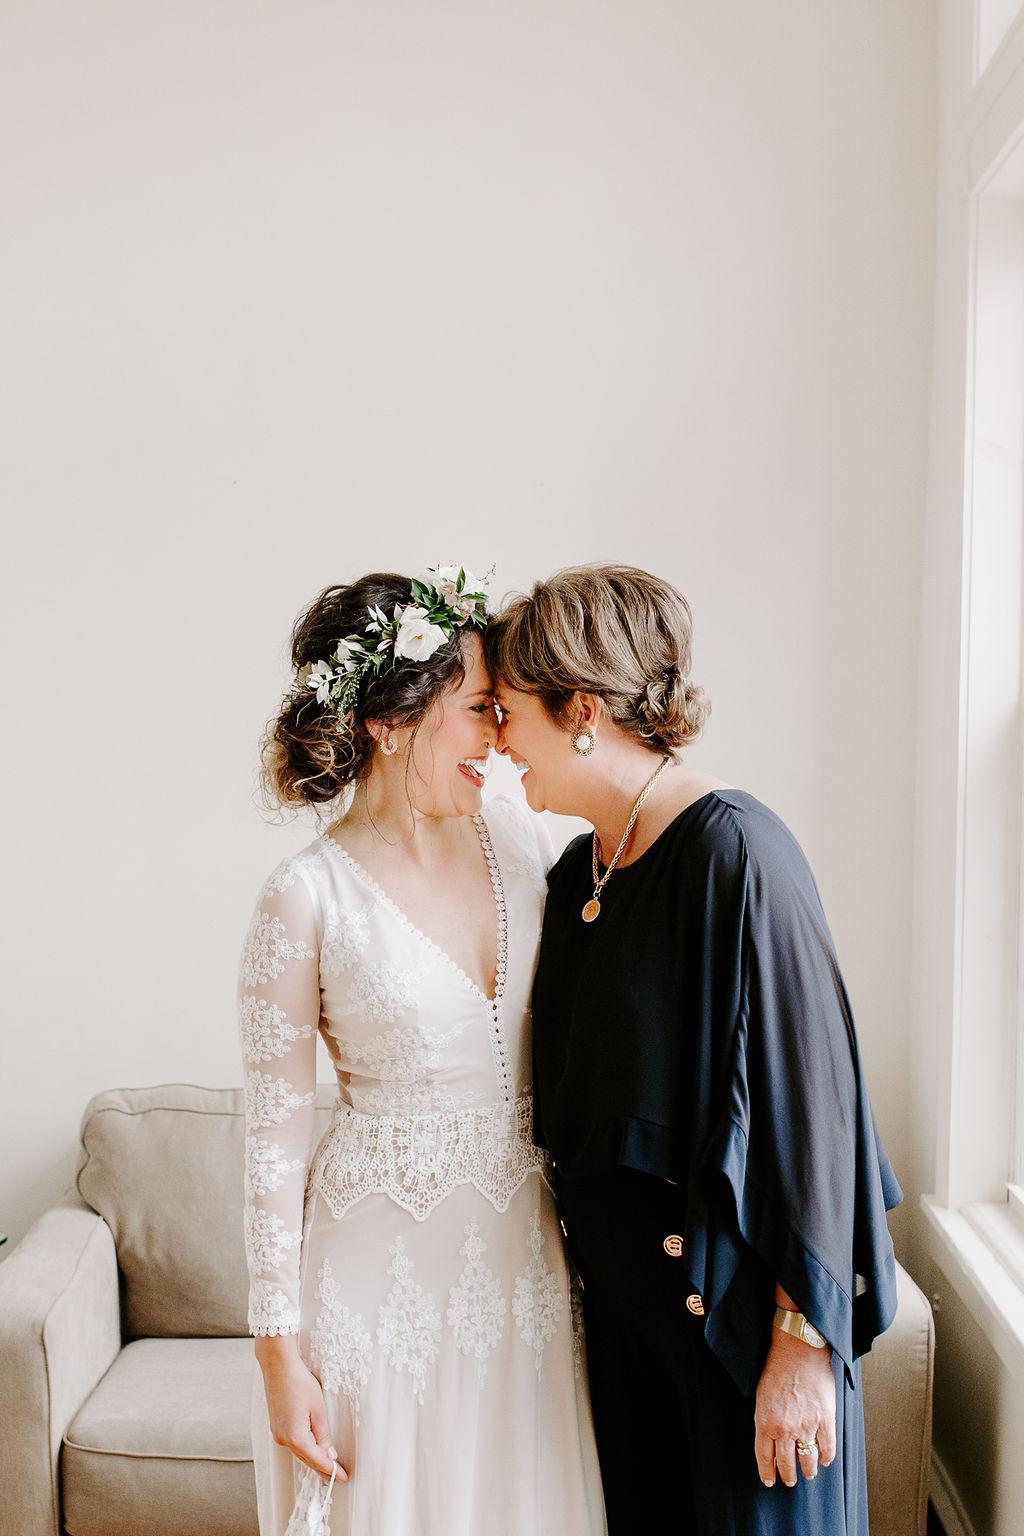 OMaine Studios Portland Maine Wedding_042719_9.jpg